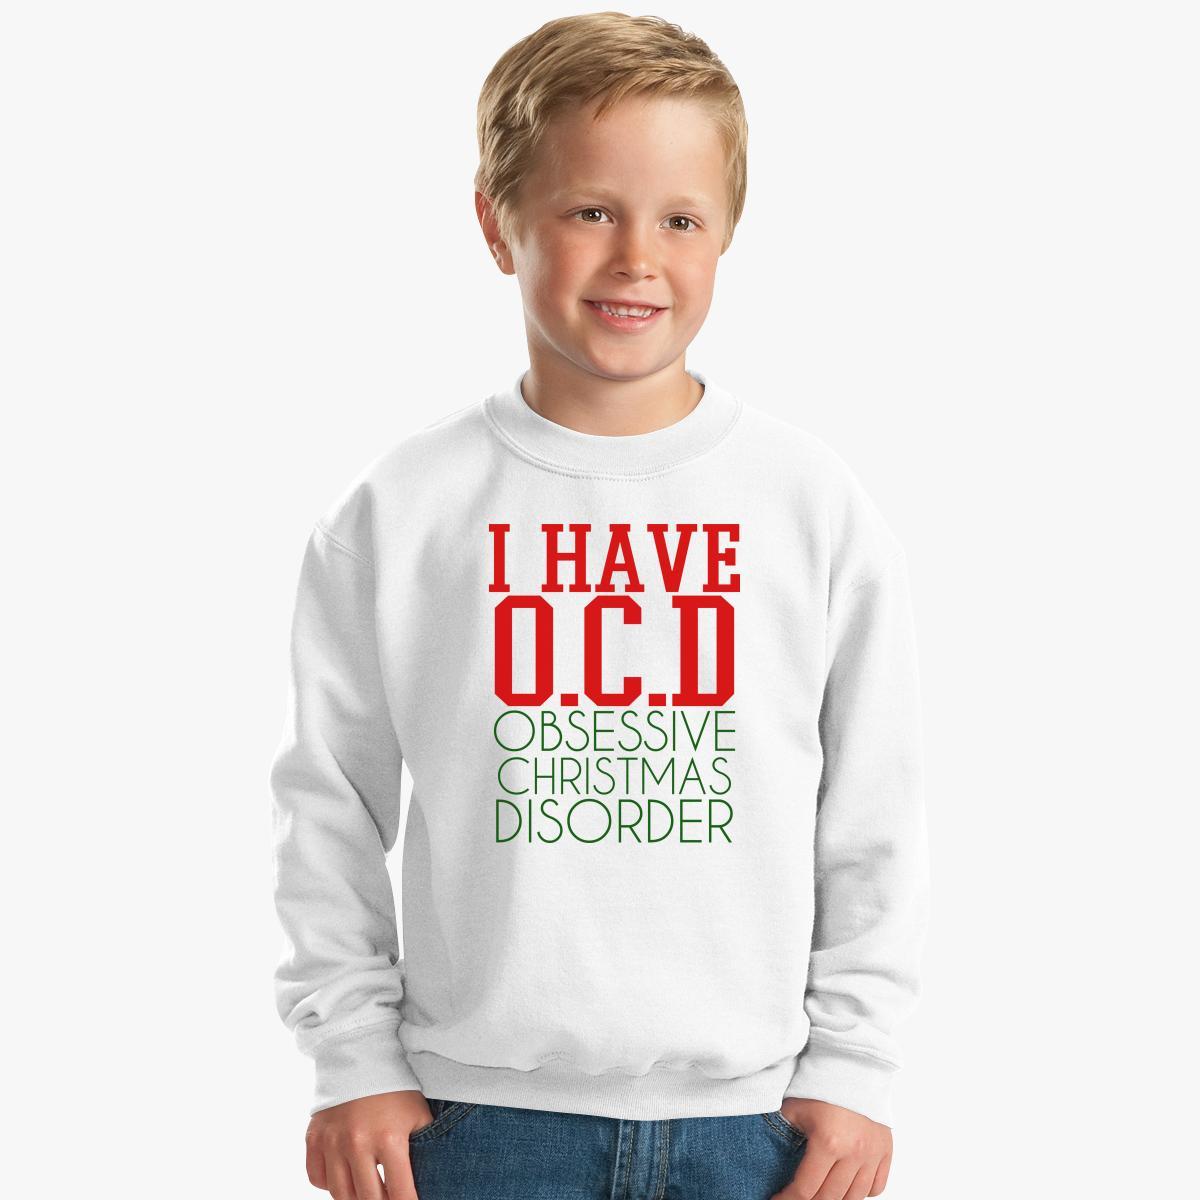 Ocd Obsessive Christmas Disorder Kids Sweatshirt   Customon.com